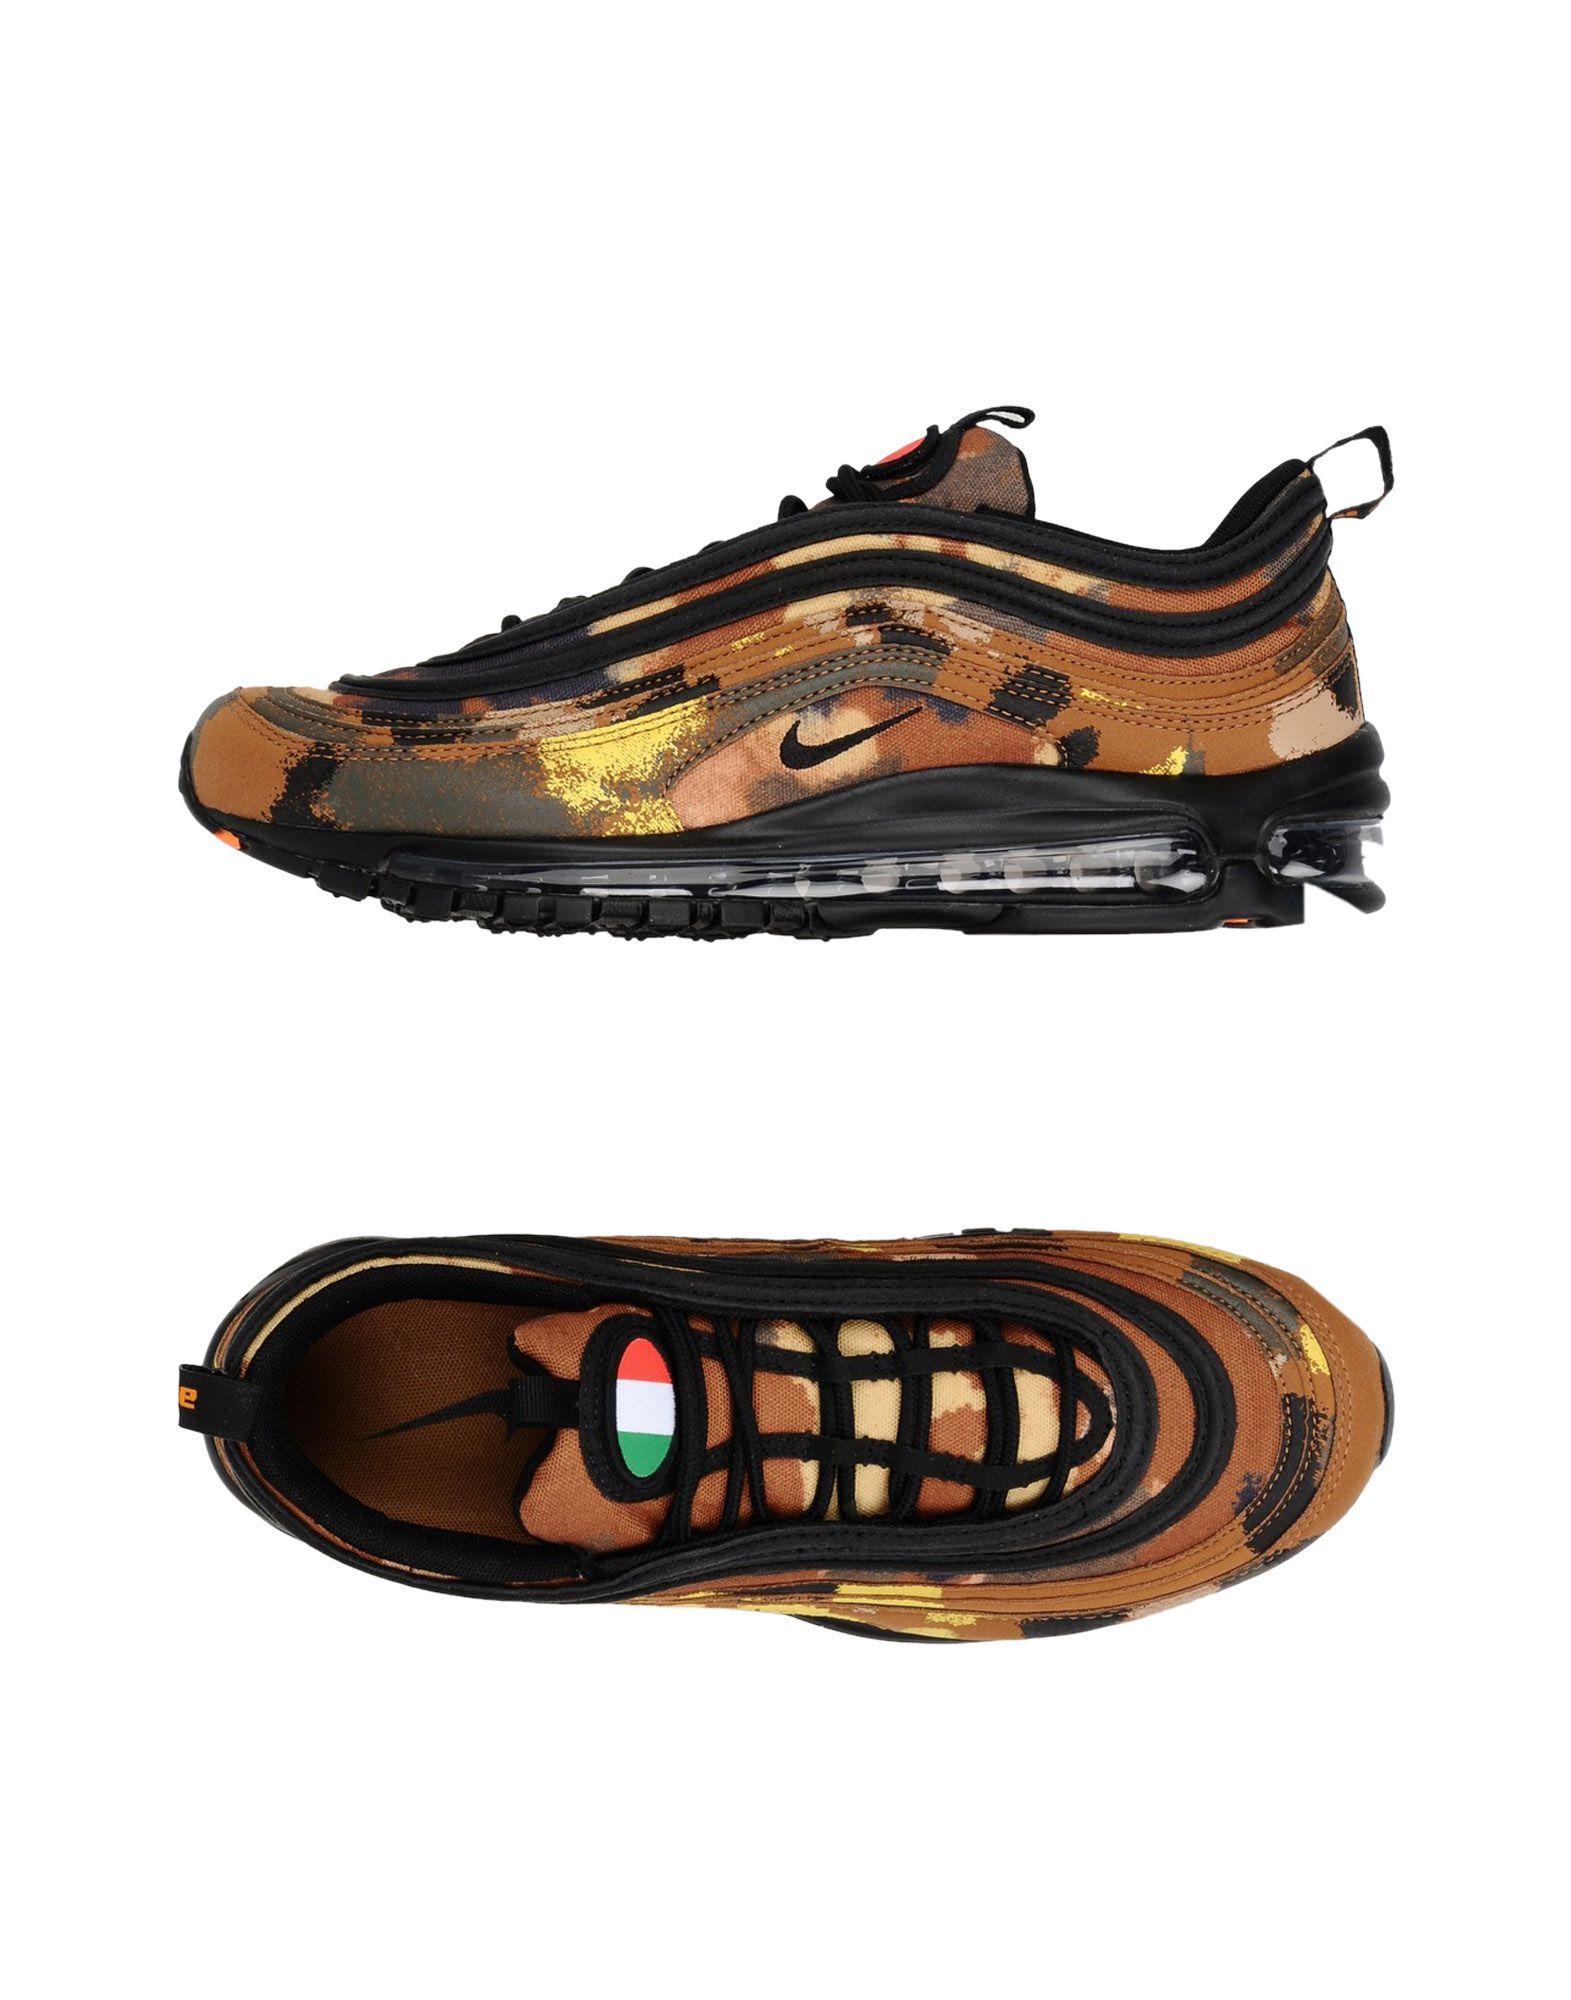 Turnschuhe Nike Nike Air Max 97 Premium Qs - herren - 11444734TO